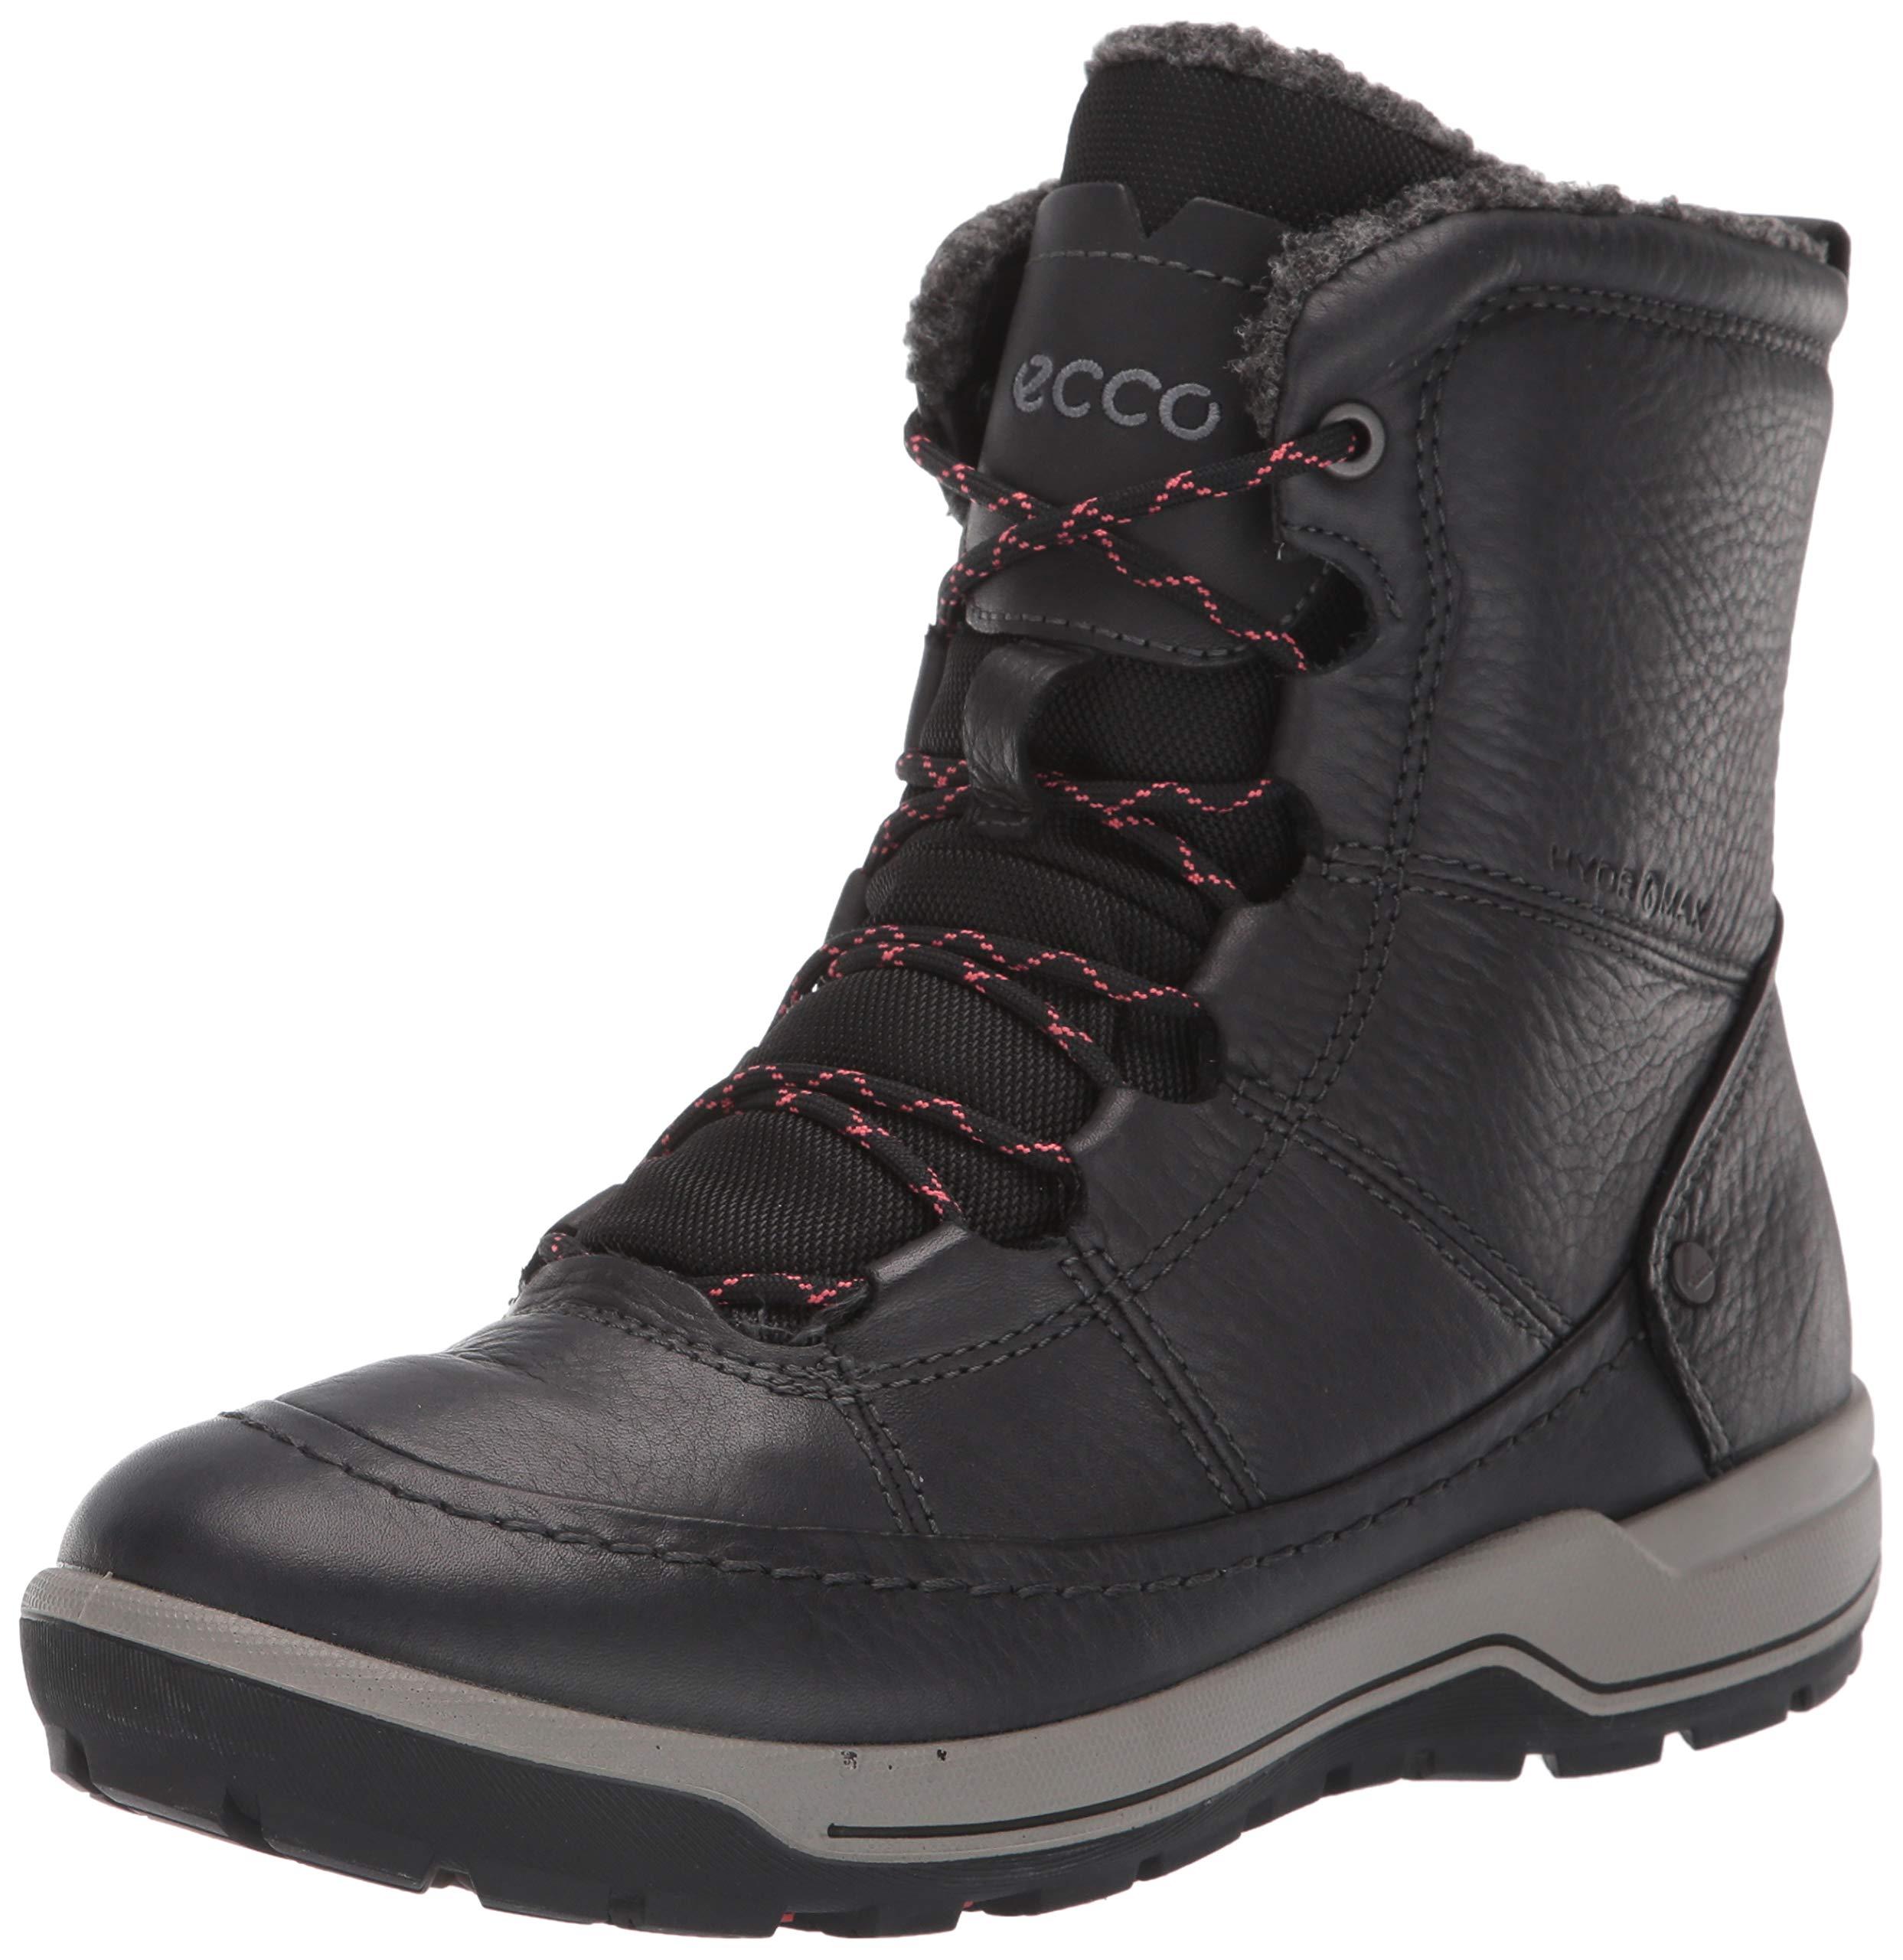 ECCO Women's Trace Lite Mid Hydromax Water-Resistant Winter Snow Boot